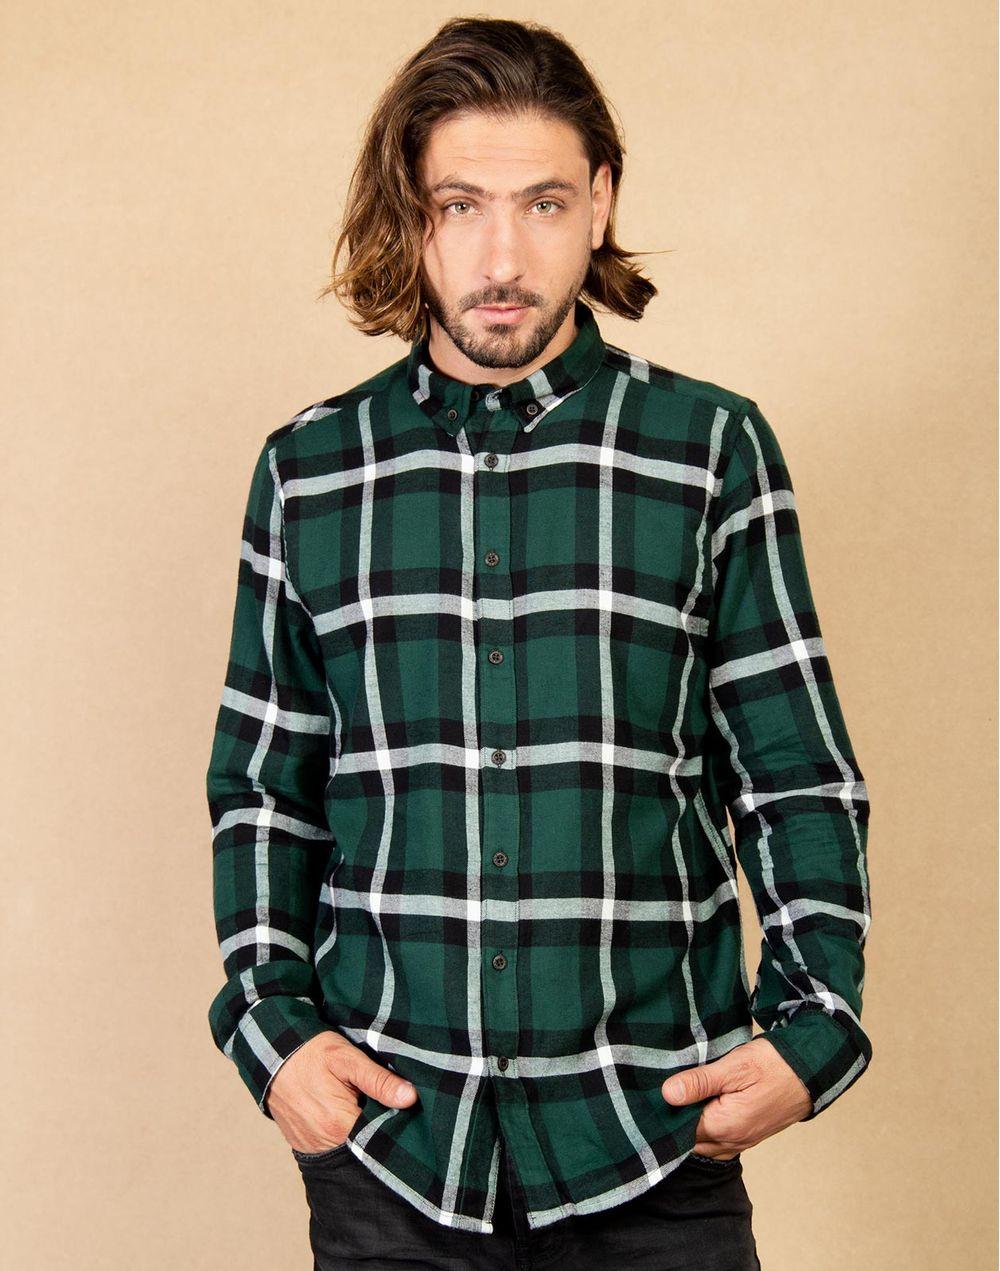 6cdd509d0899c Camisa Leñadora Regular Fit Verde XL Compra en tienda COLOR BLUE ...